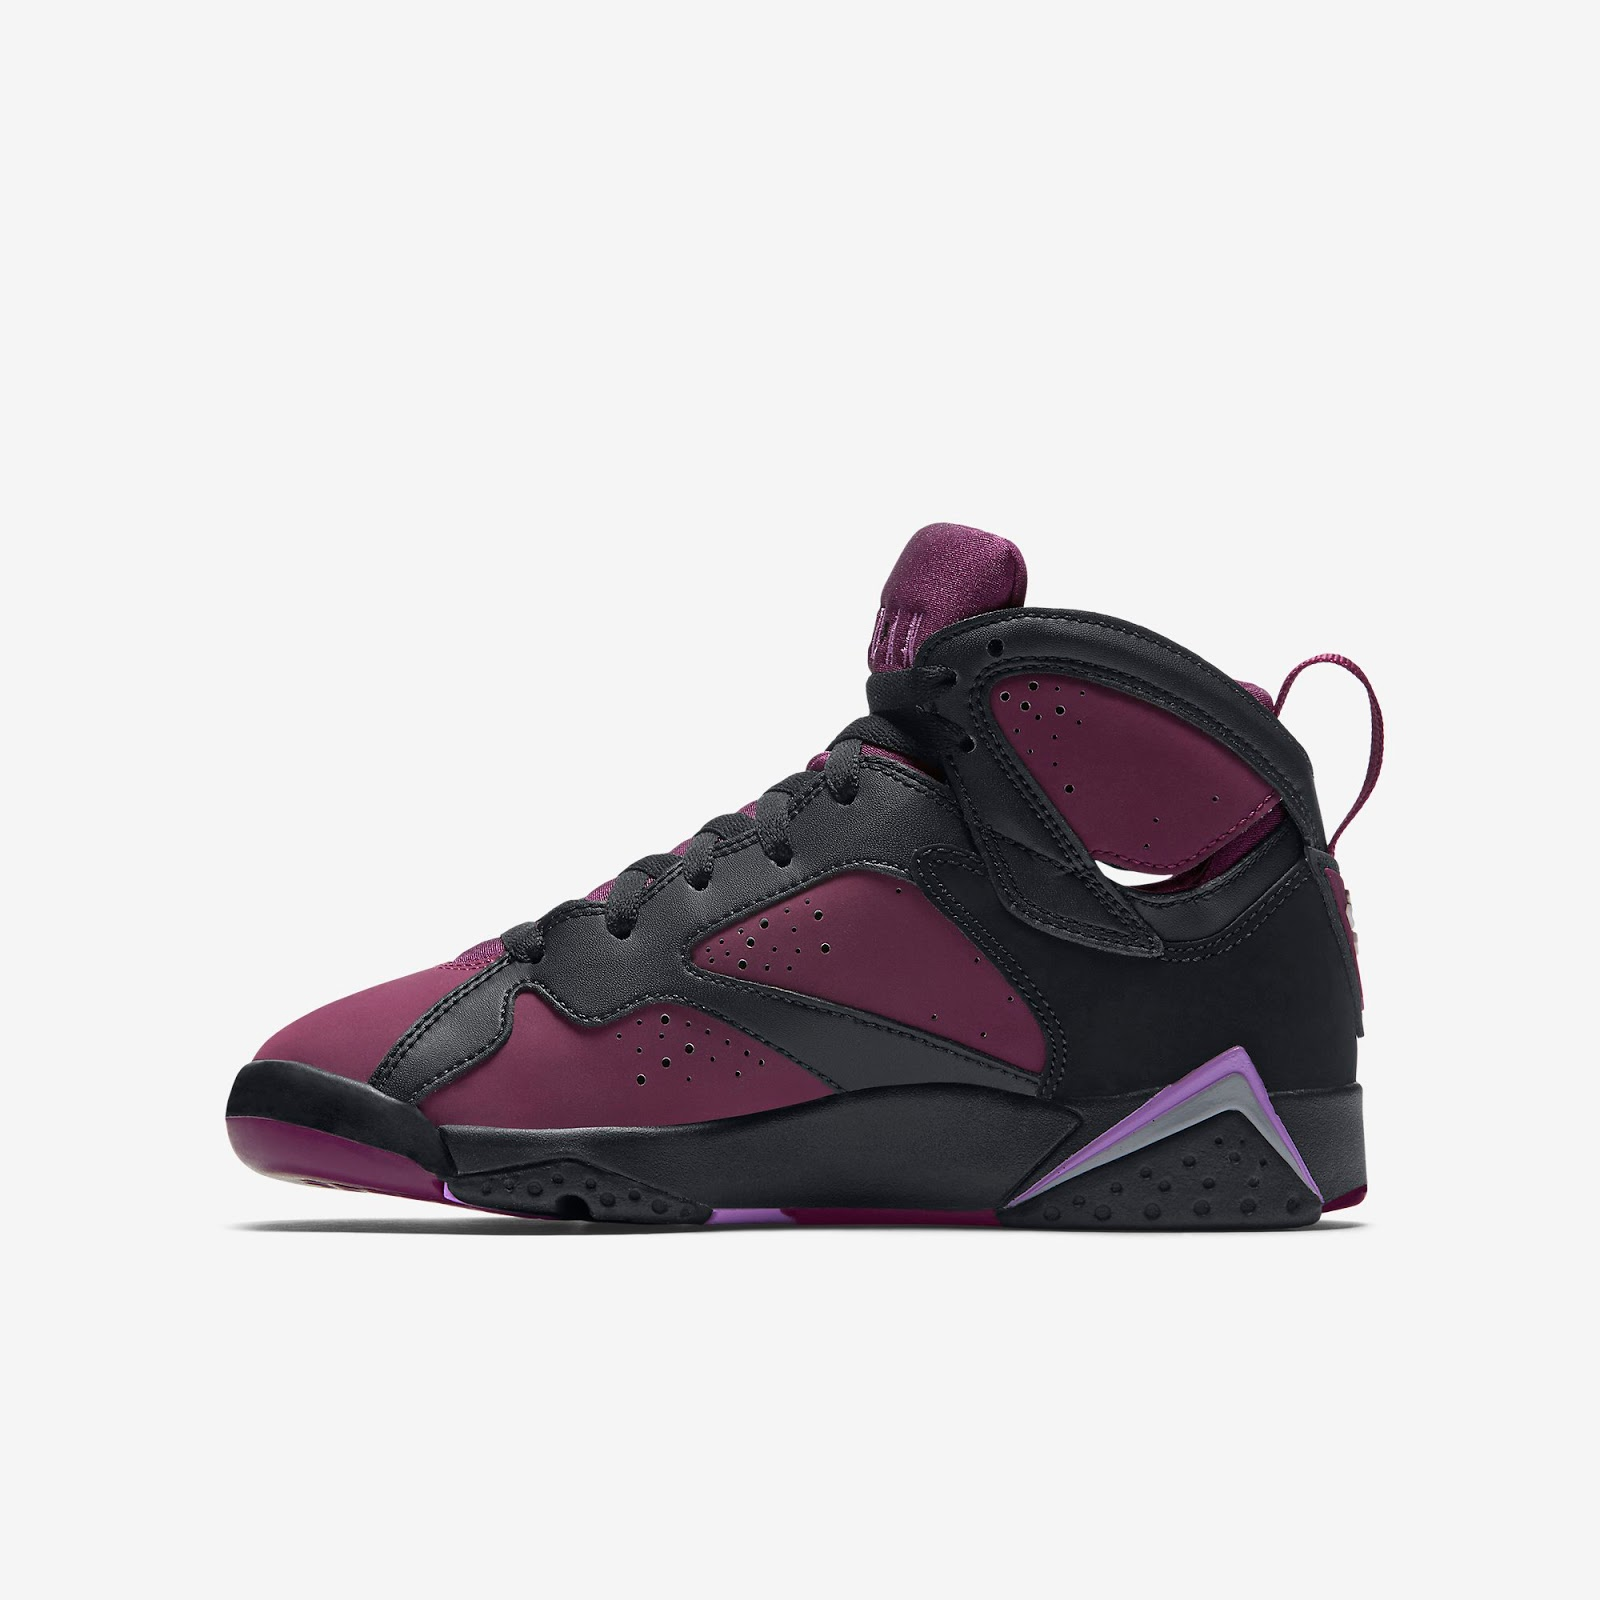 c26a7d551007 ajordanxi Your  1 Source For Sneaker Release Dates  Girls Air Jordan ...